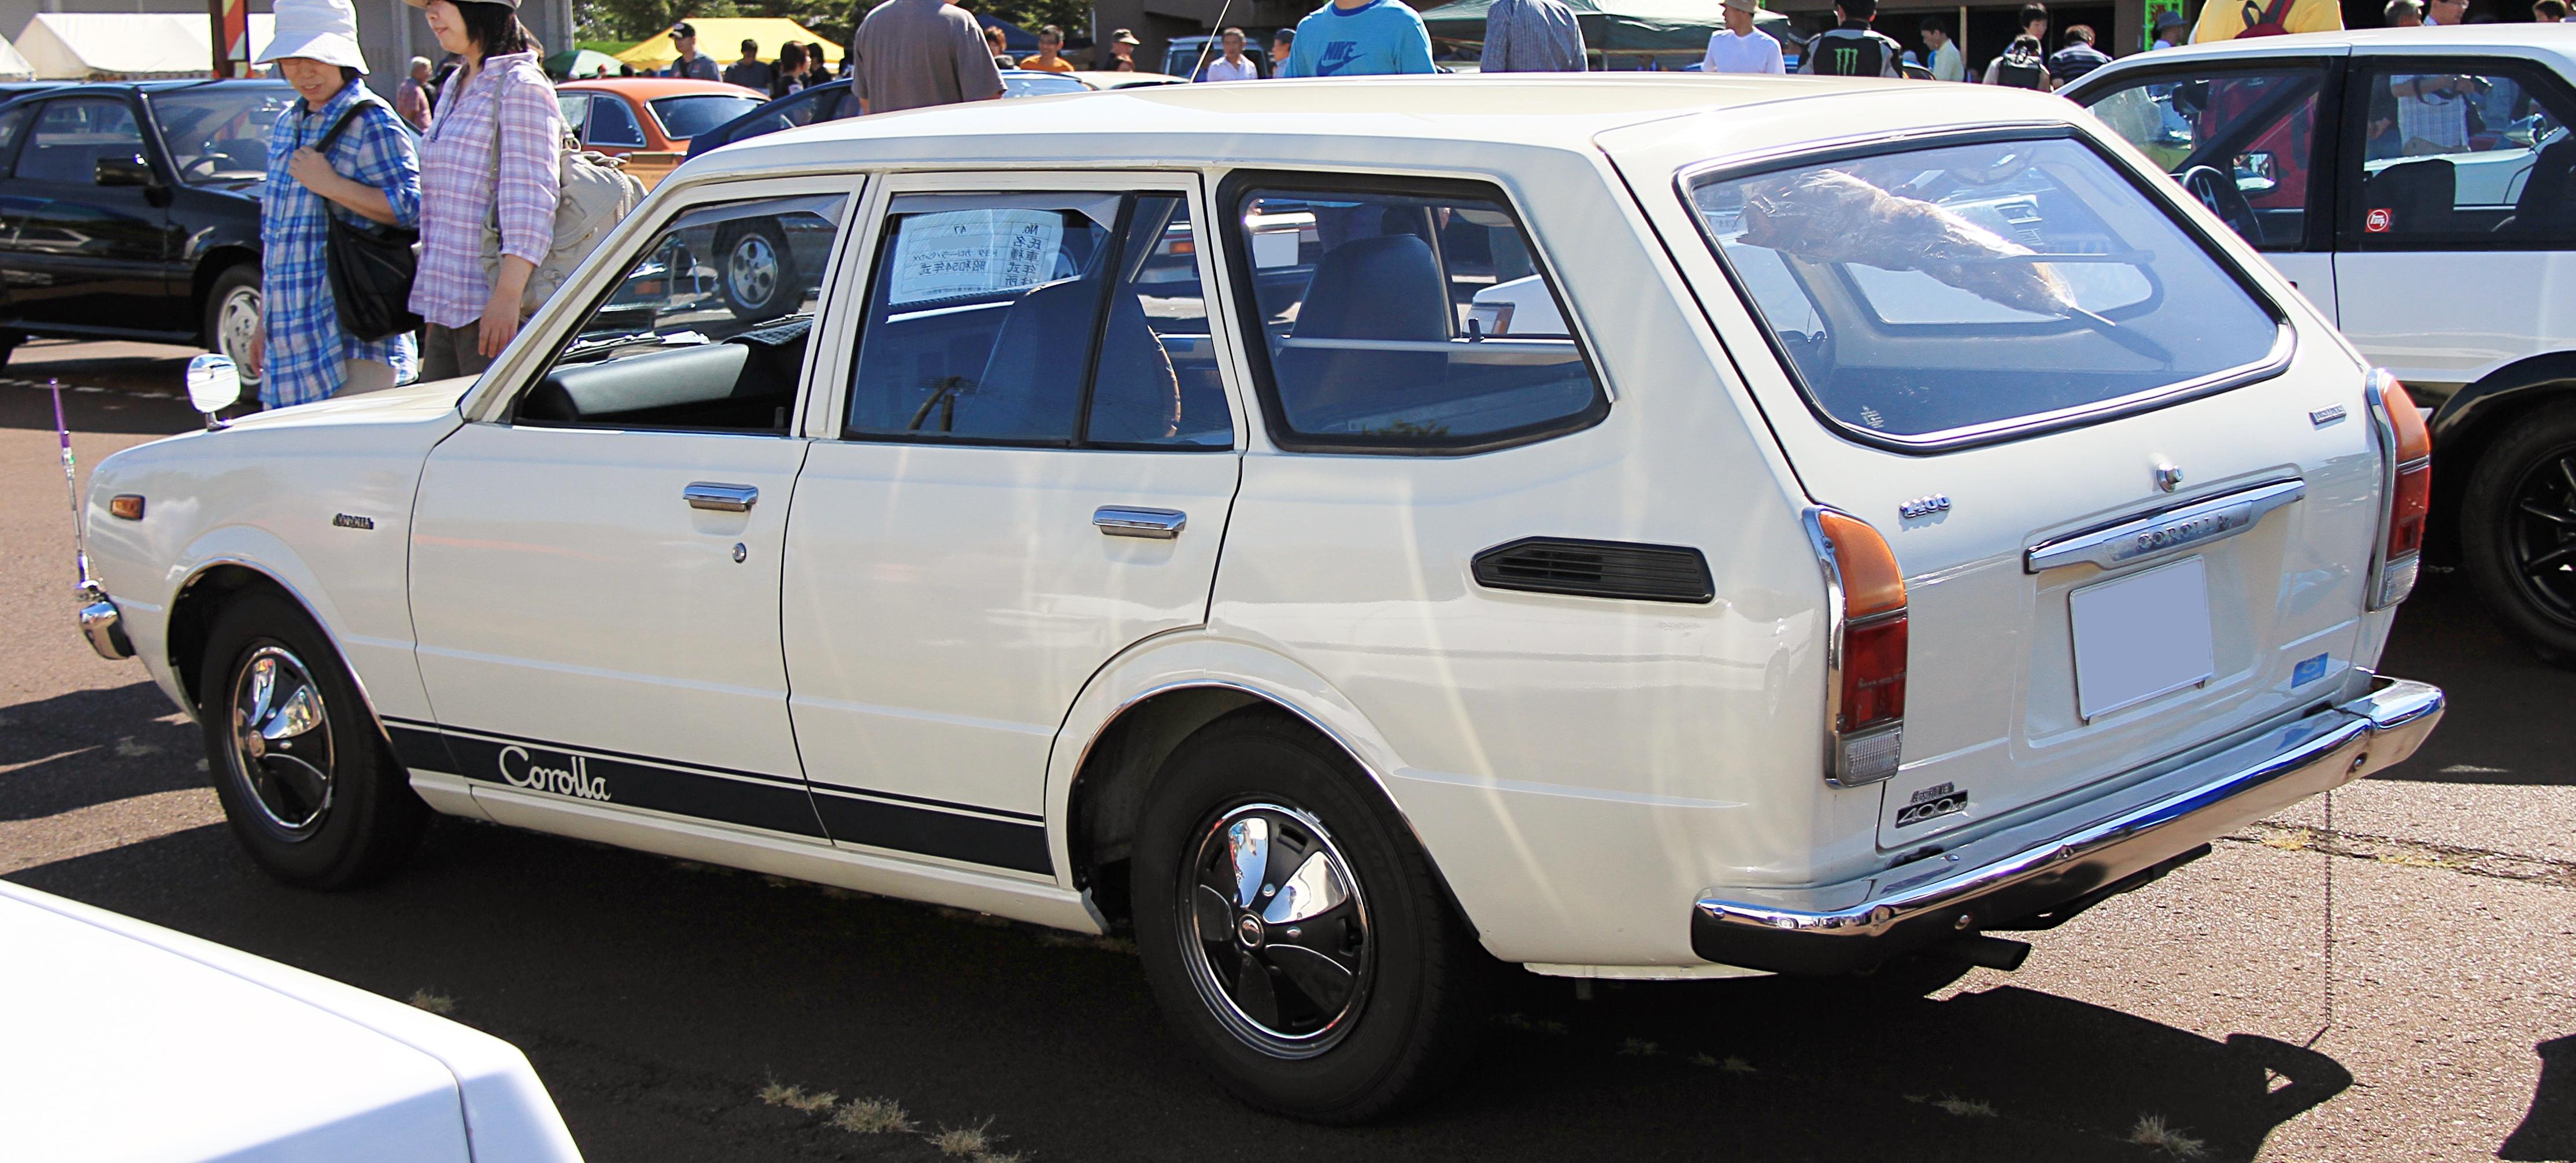 Kelebihan Toyota Corolla 1979 Spesifikasi